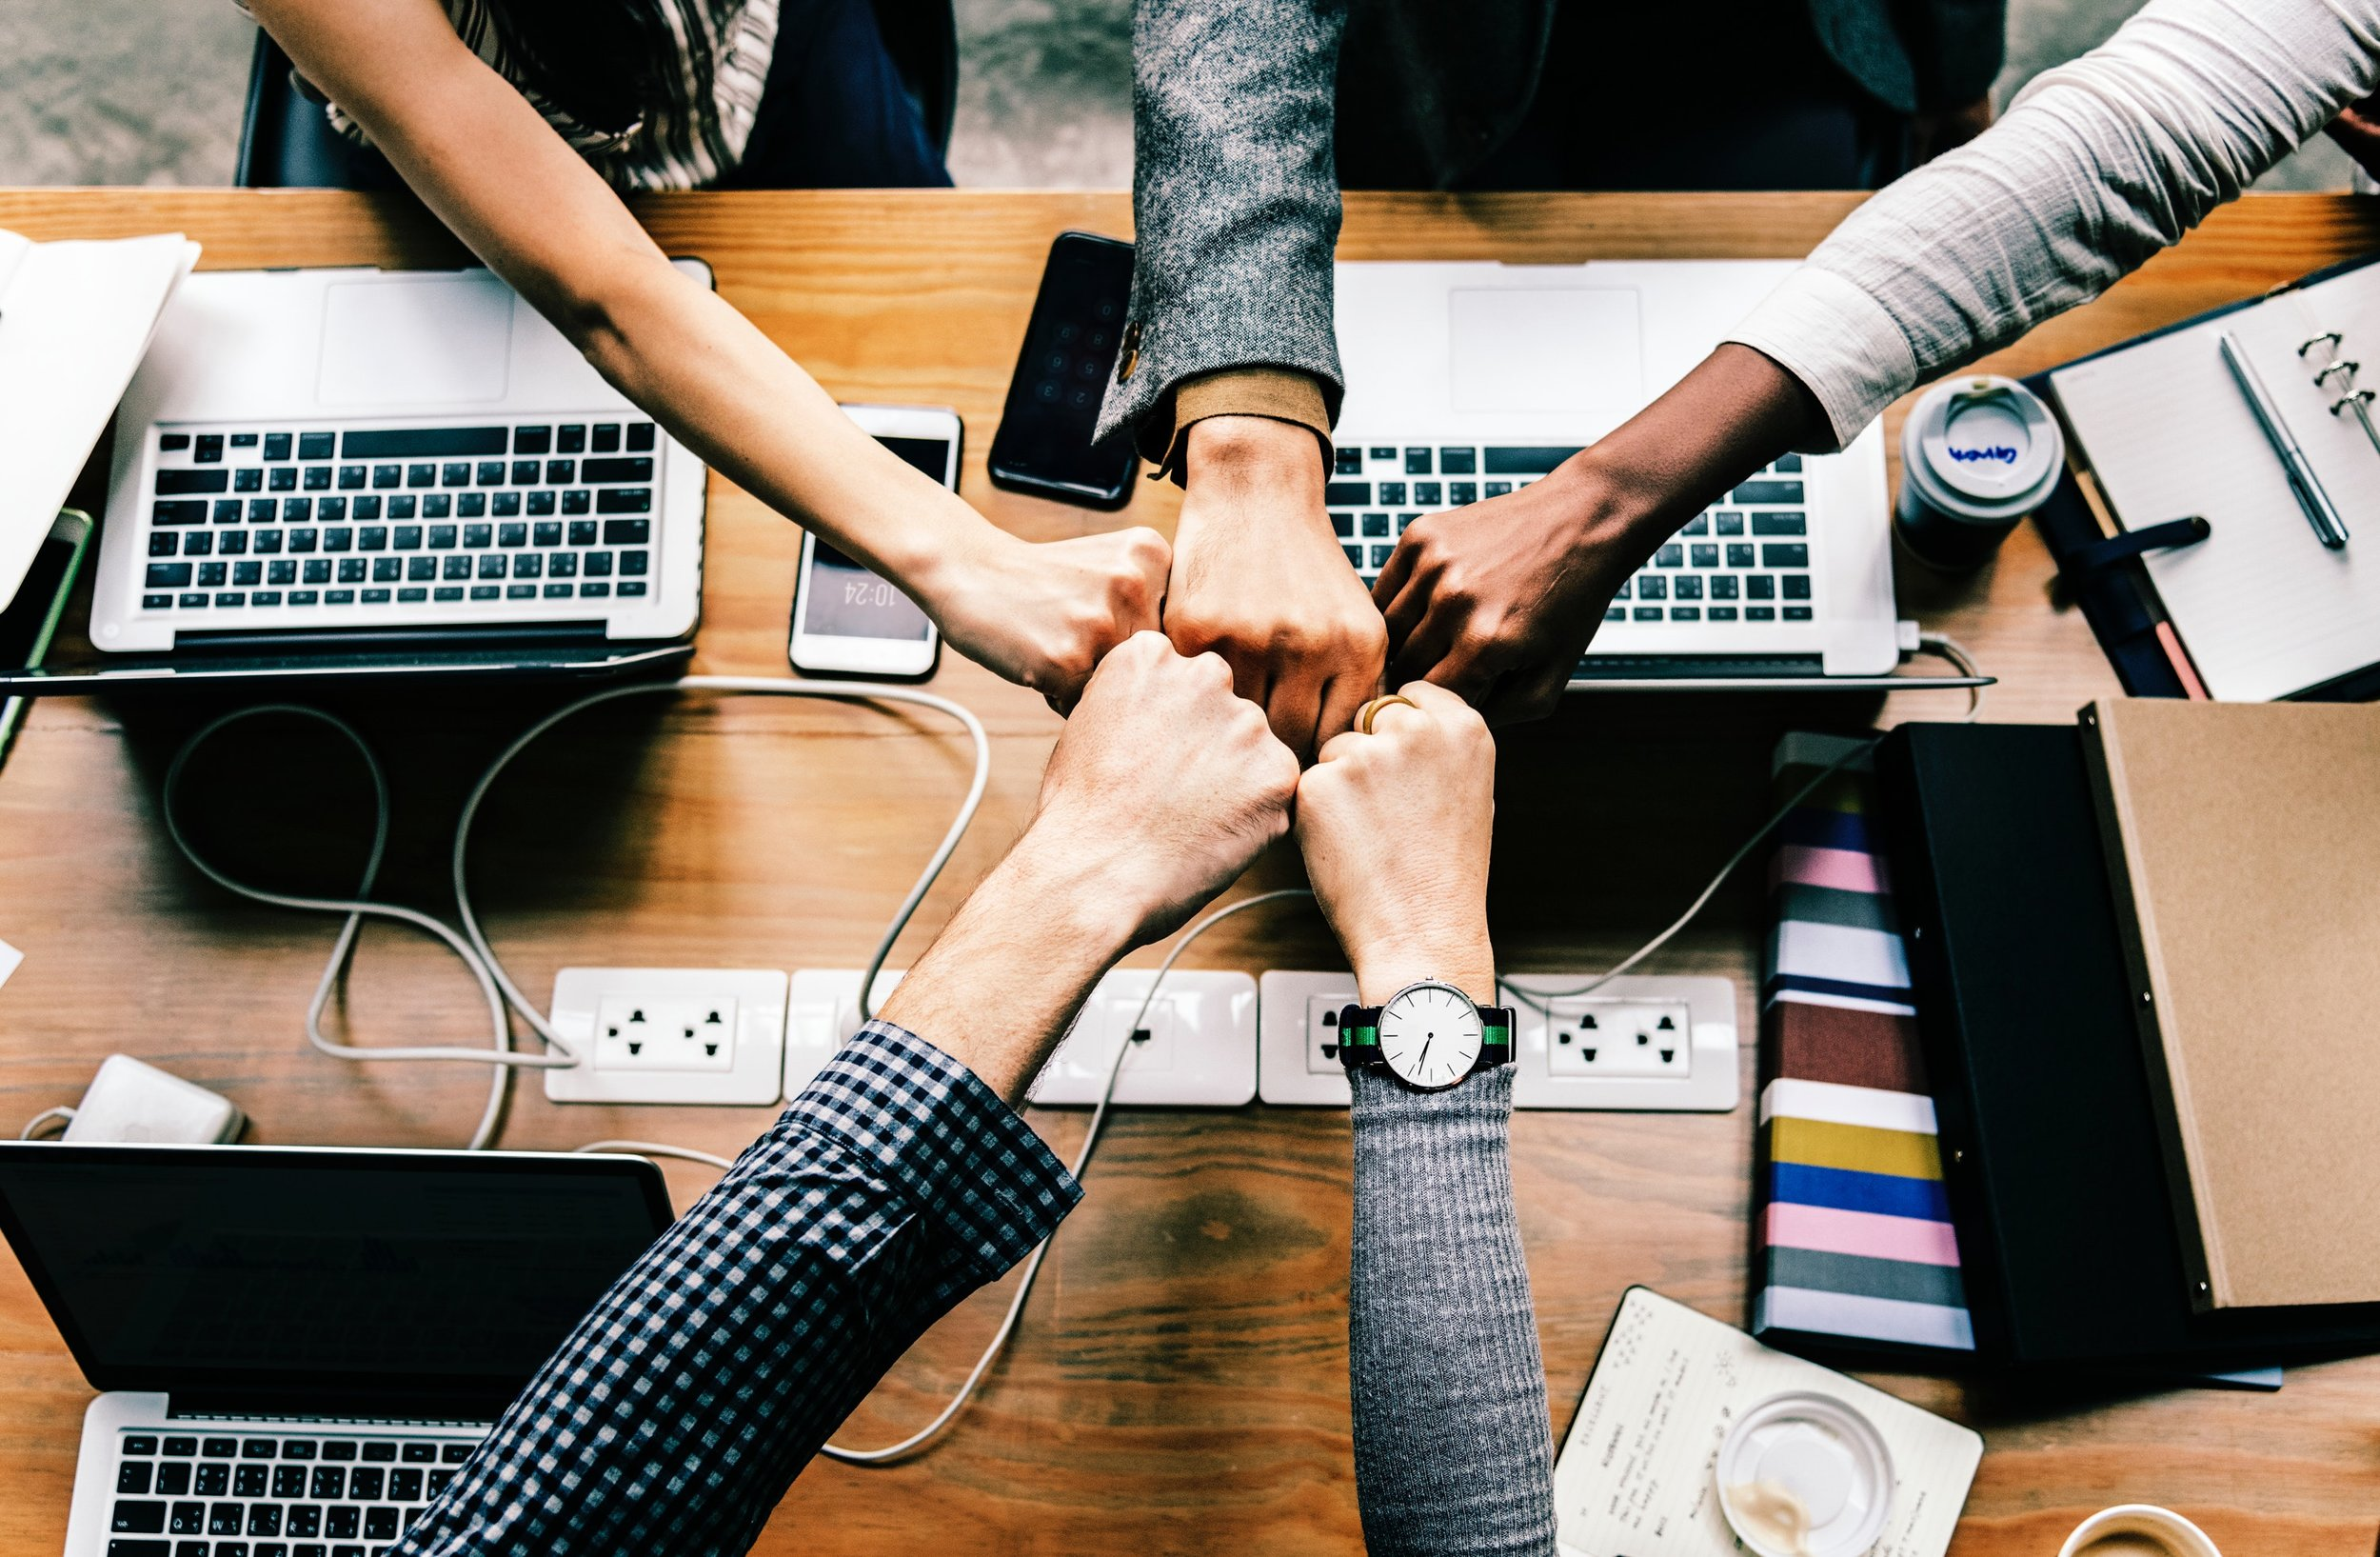 bump-collaboration-colleagues-1068523.jpg